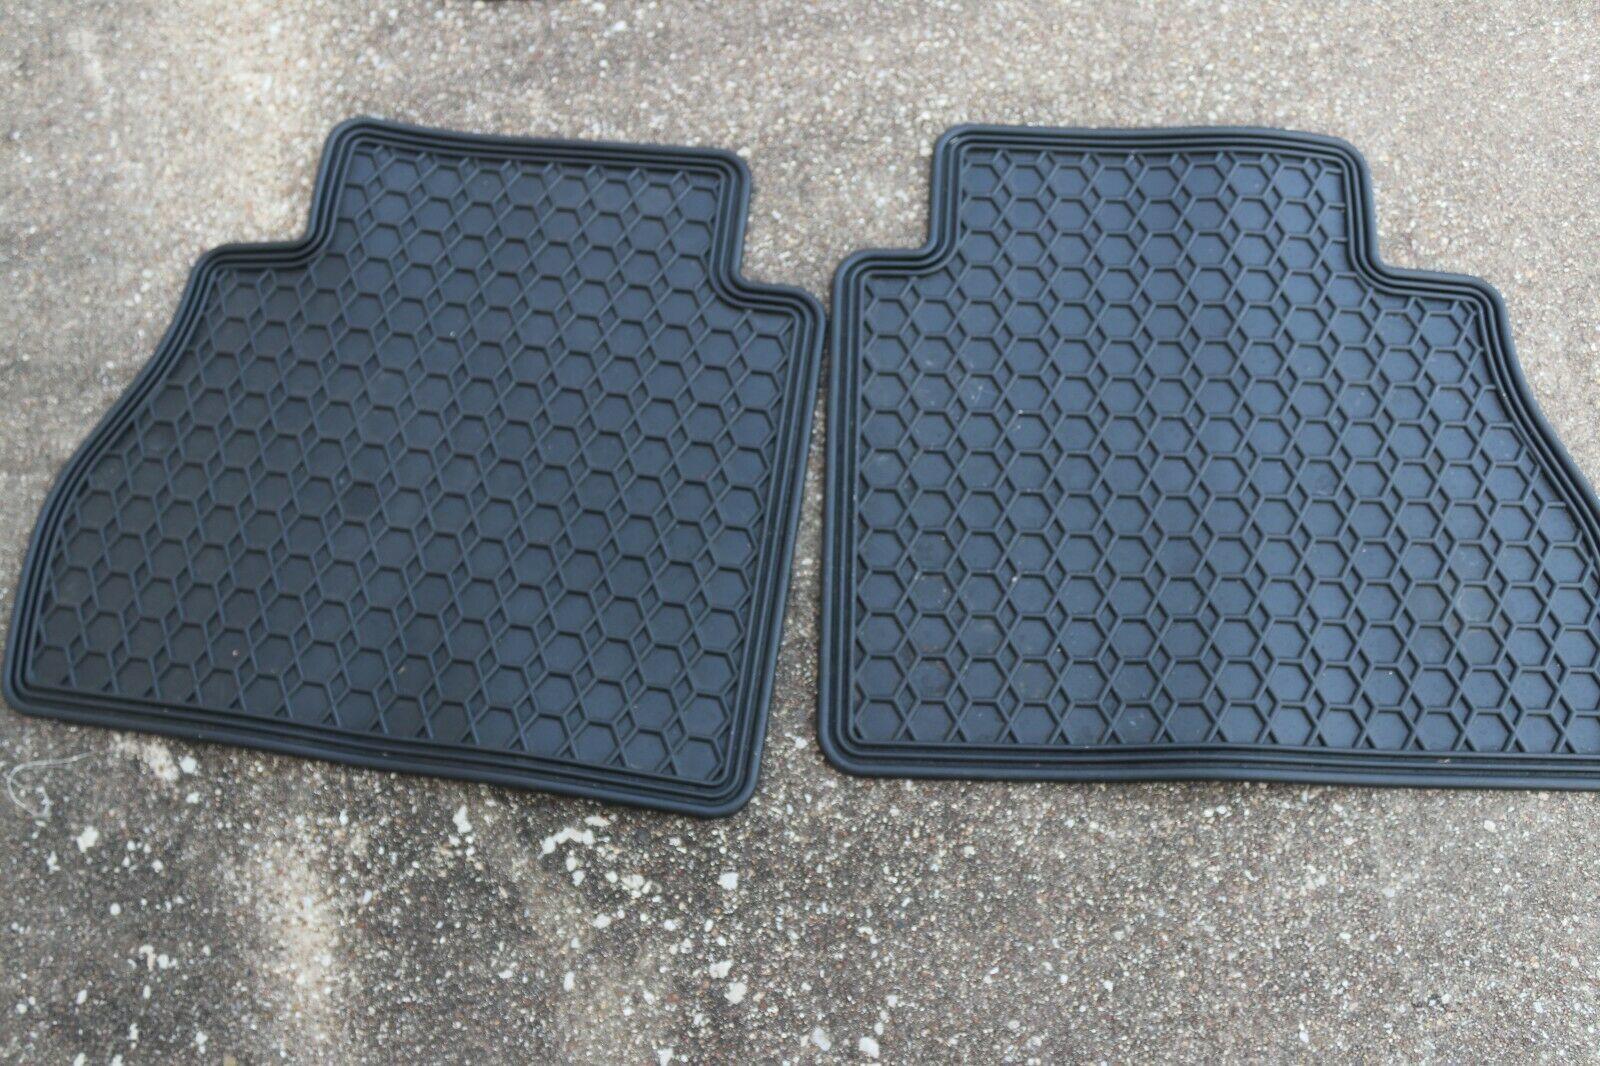 Toyota Fj Cruiser Oem All Weather Floor Mats Carpet